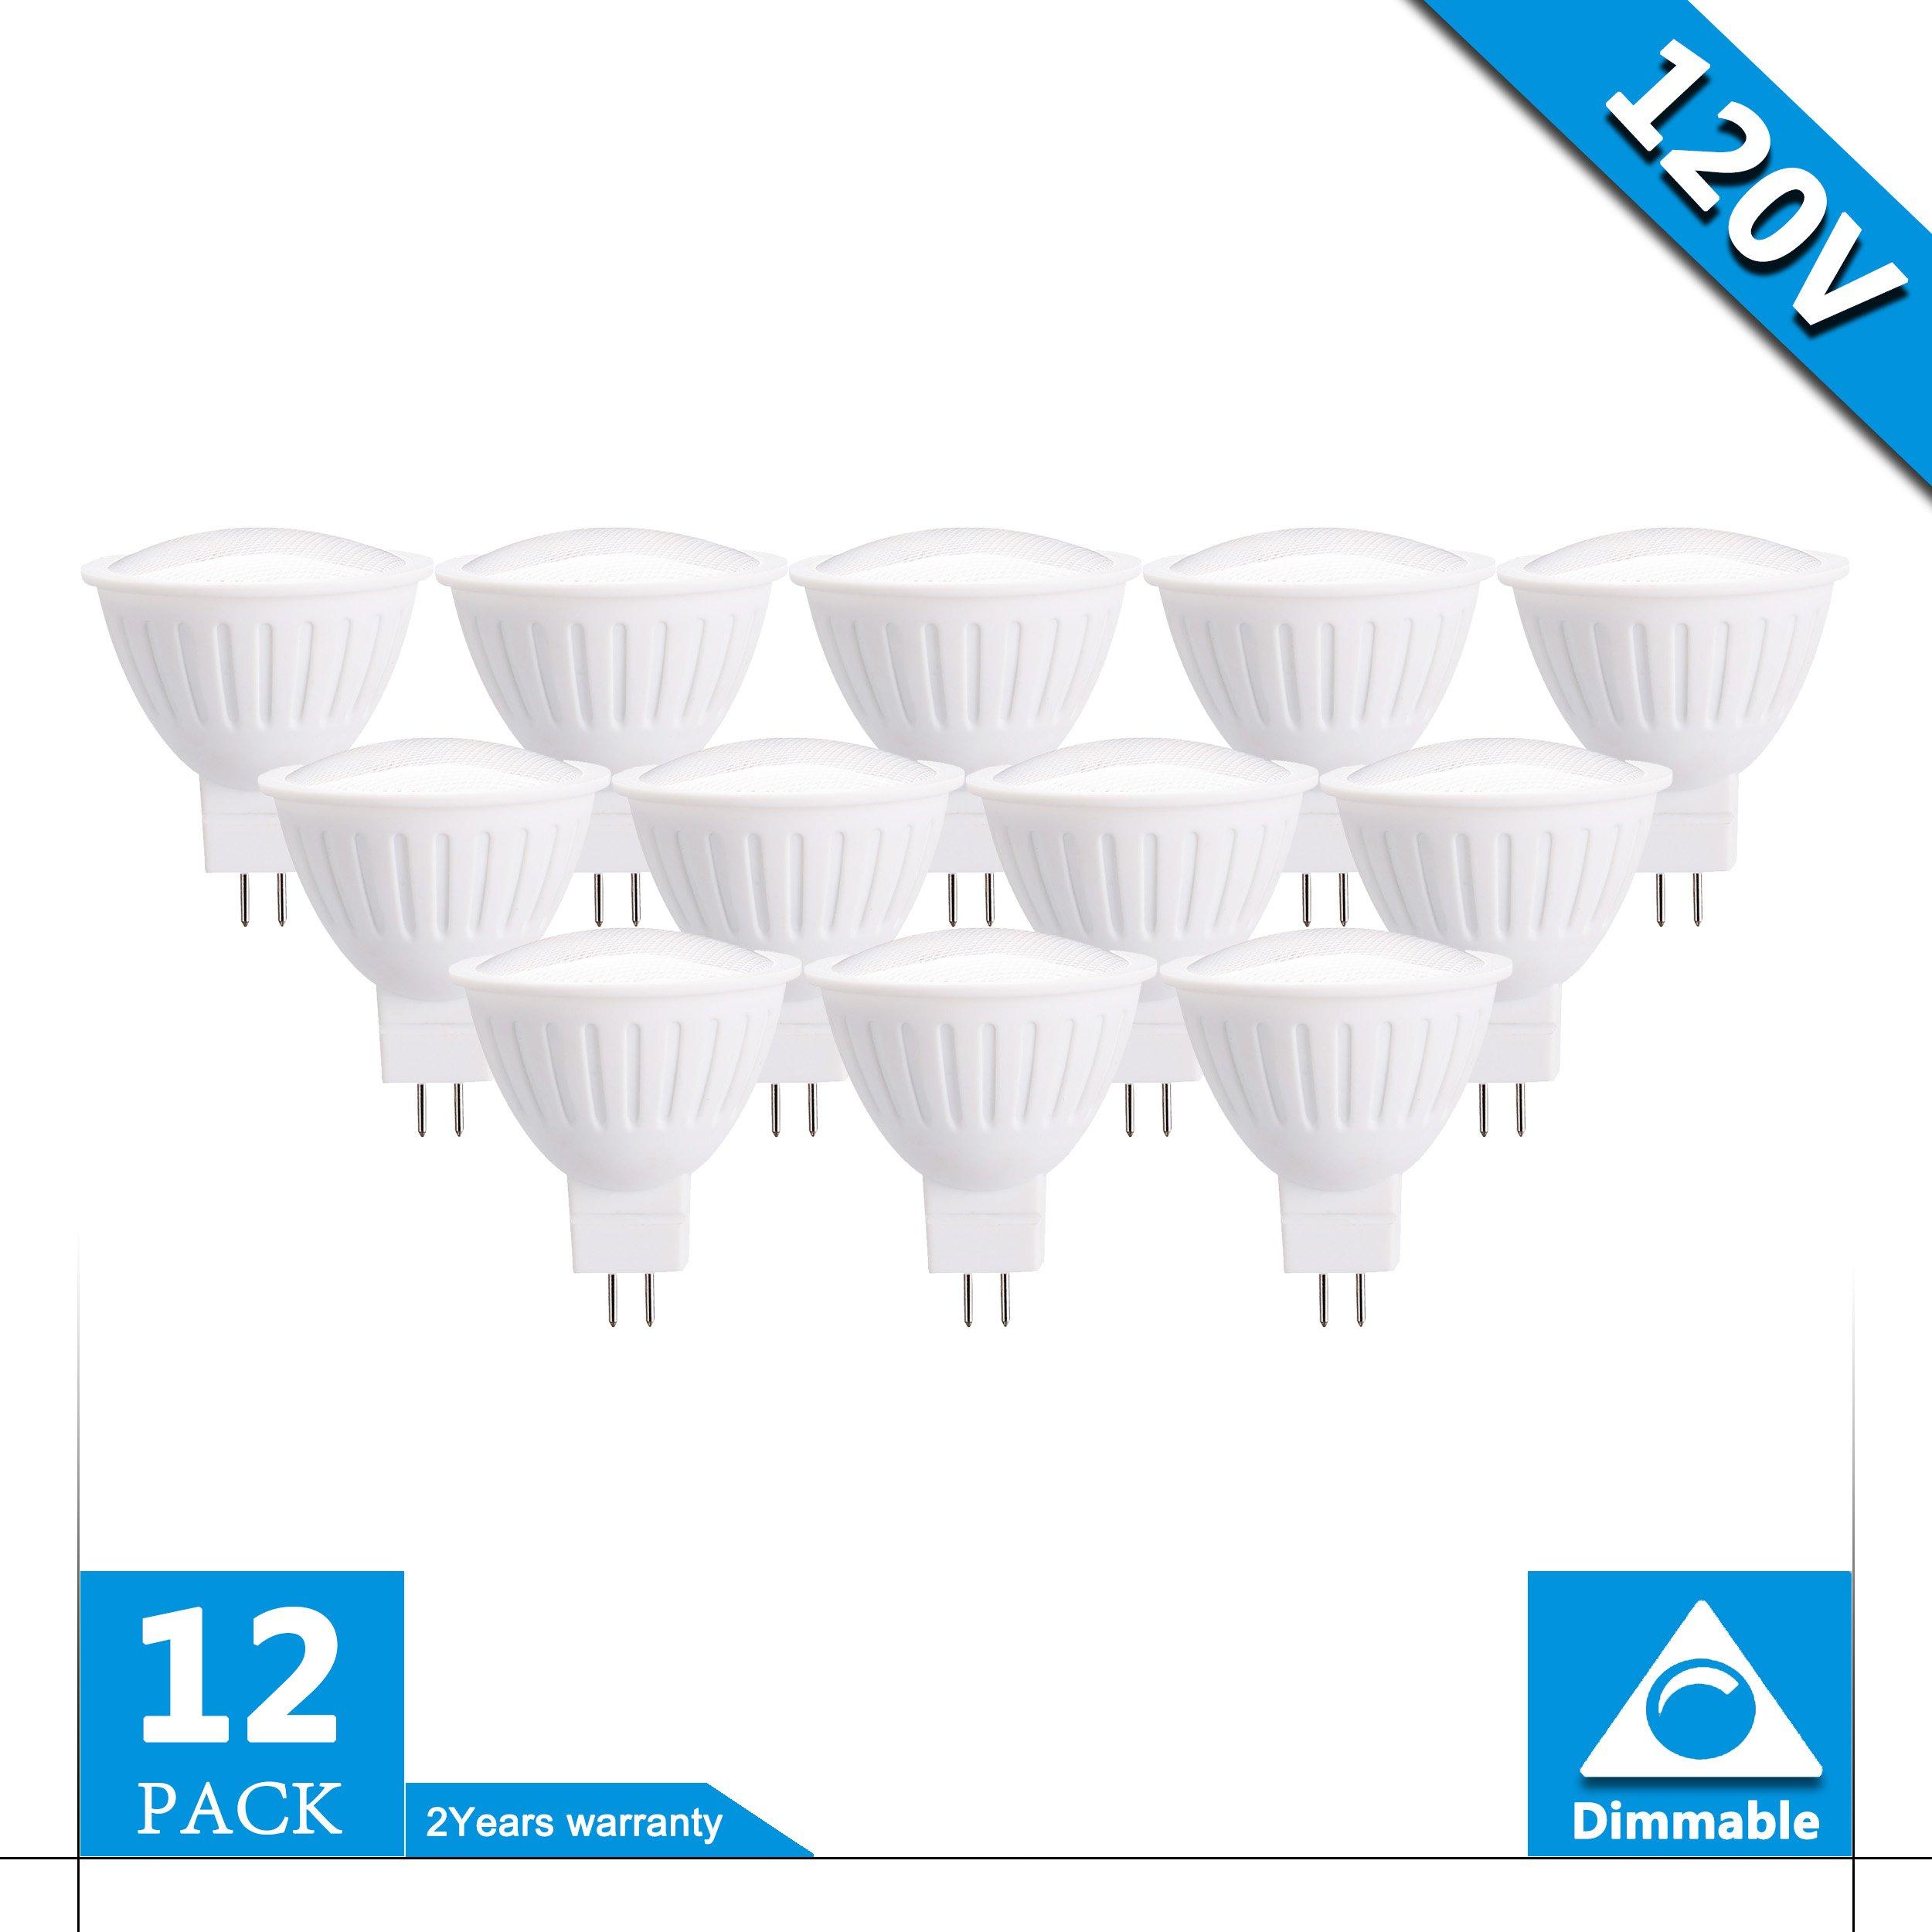 (Pack of 12) 5W 120V Dimmable gu5.3 Led Light Bulbs 50W Equivalent, 100% Aluminum Reflector 5000K Daylight White, 120 Degree Beam Angle, CRI>85,Track Lighting, Recessed Light